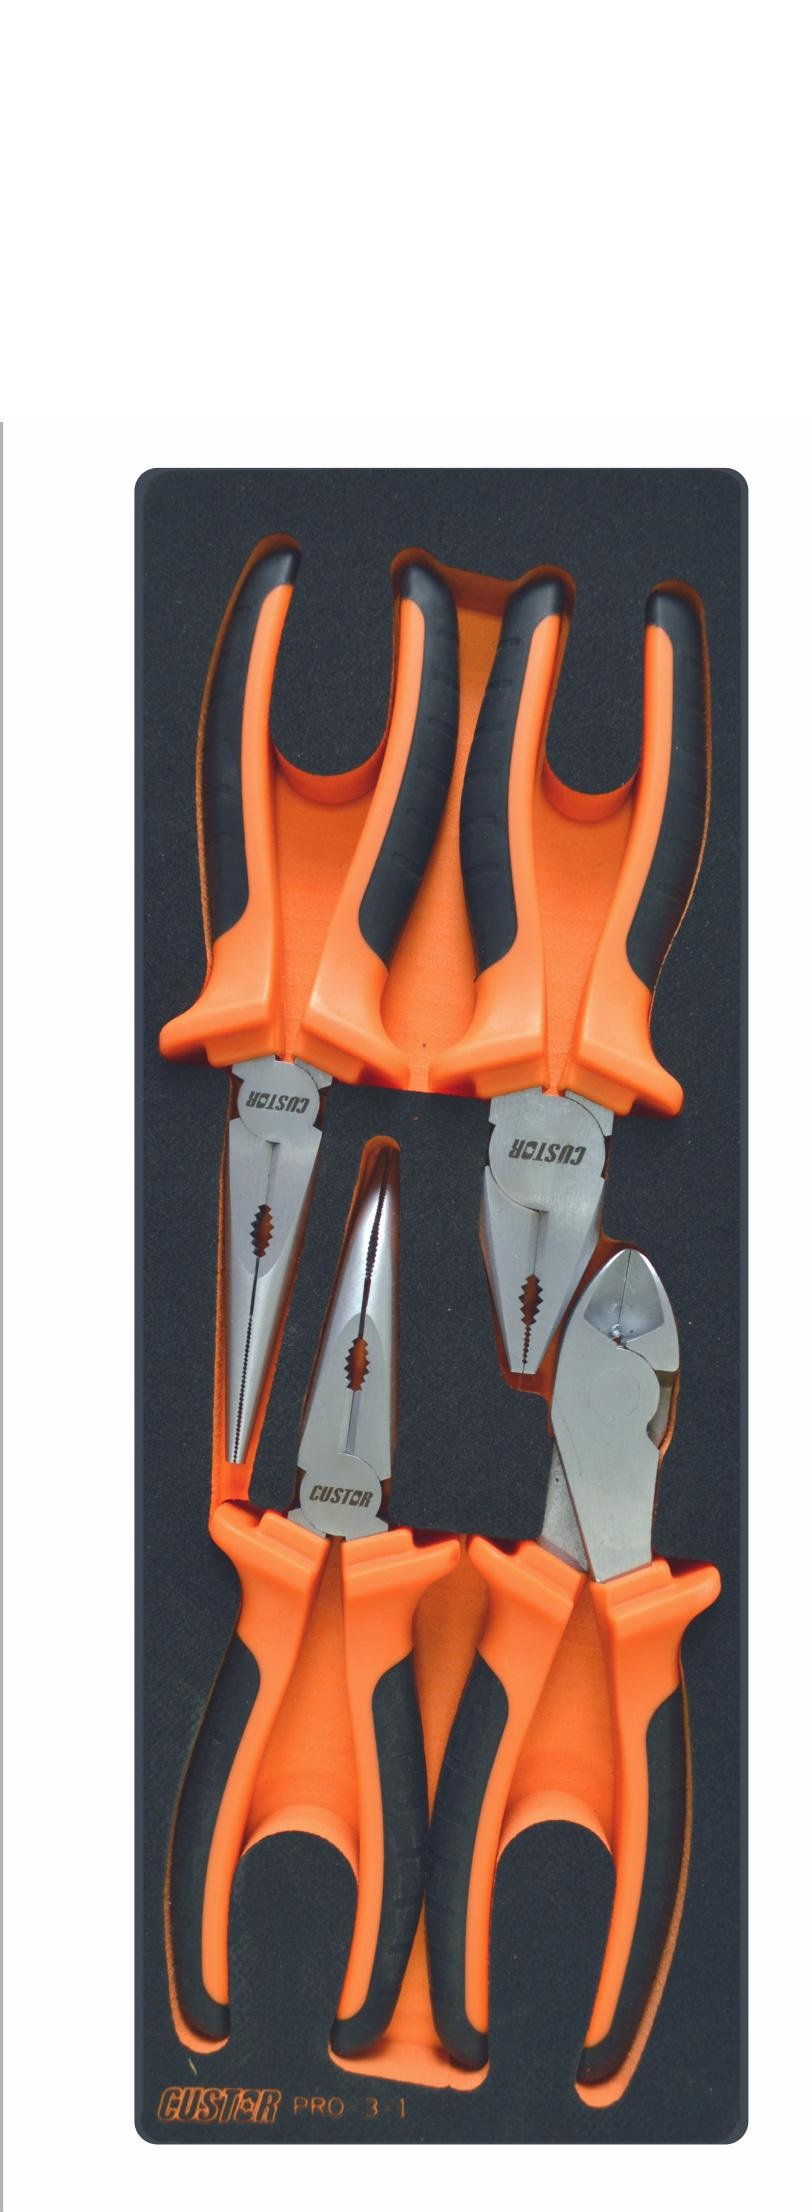 Набор инструментов Custor Pro-3-1